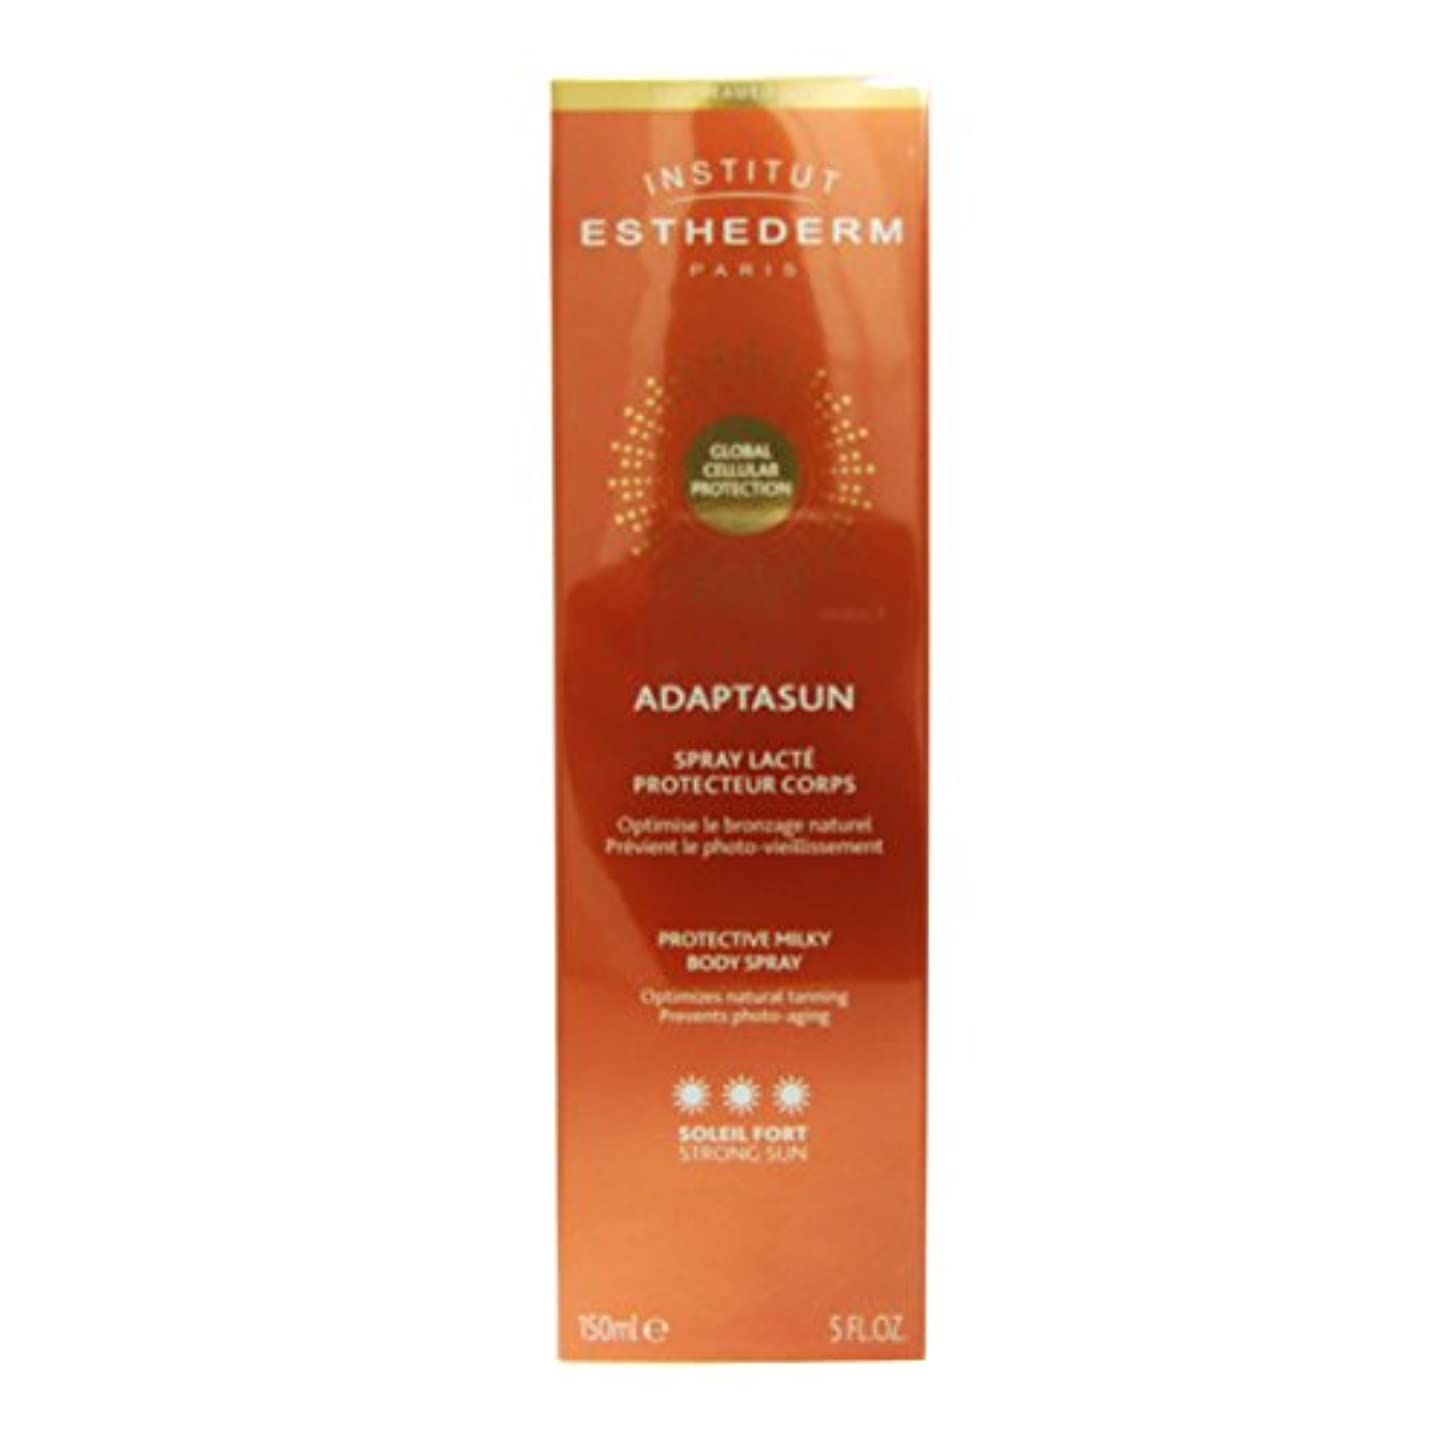 妖精洗練病なInstitut Esthederm Adaptasun Protective Milky Body Spray Strong Sun 150ml [並行輸入品]